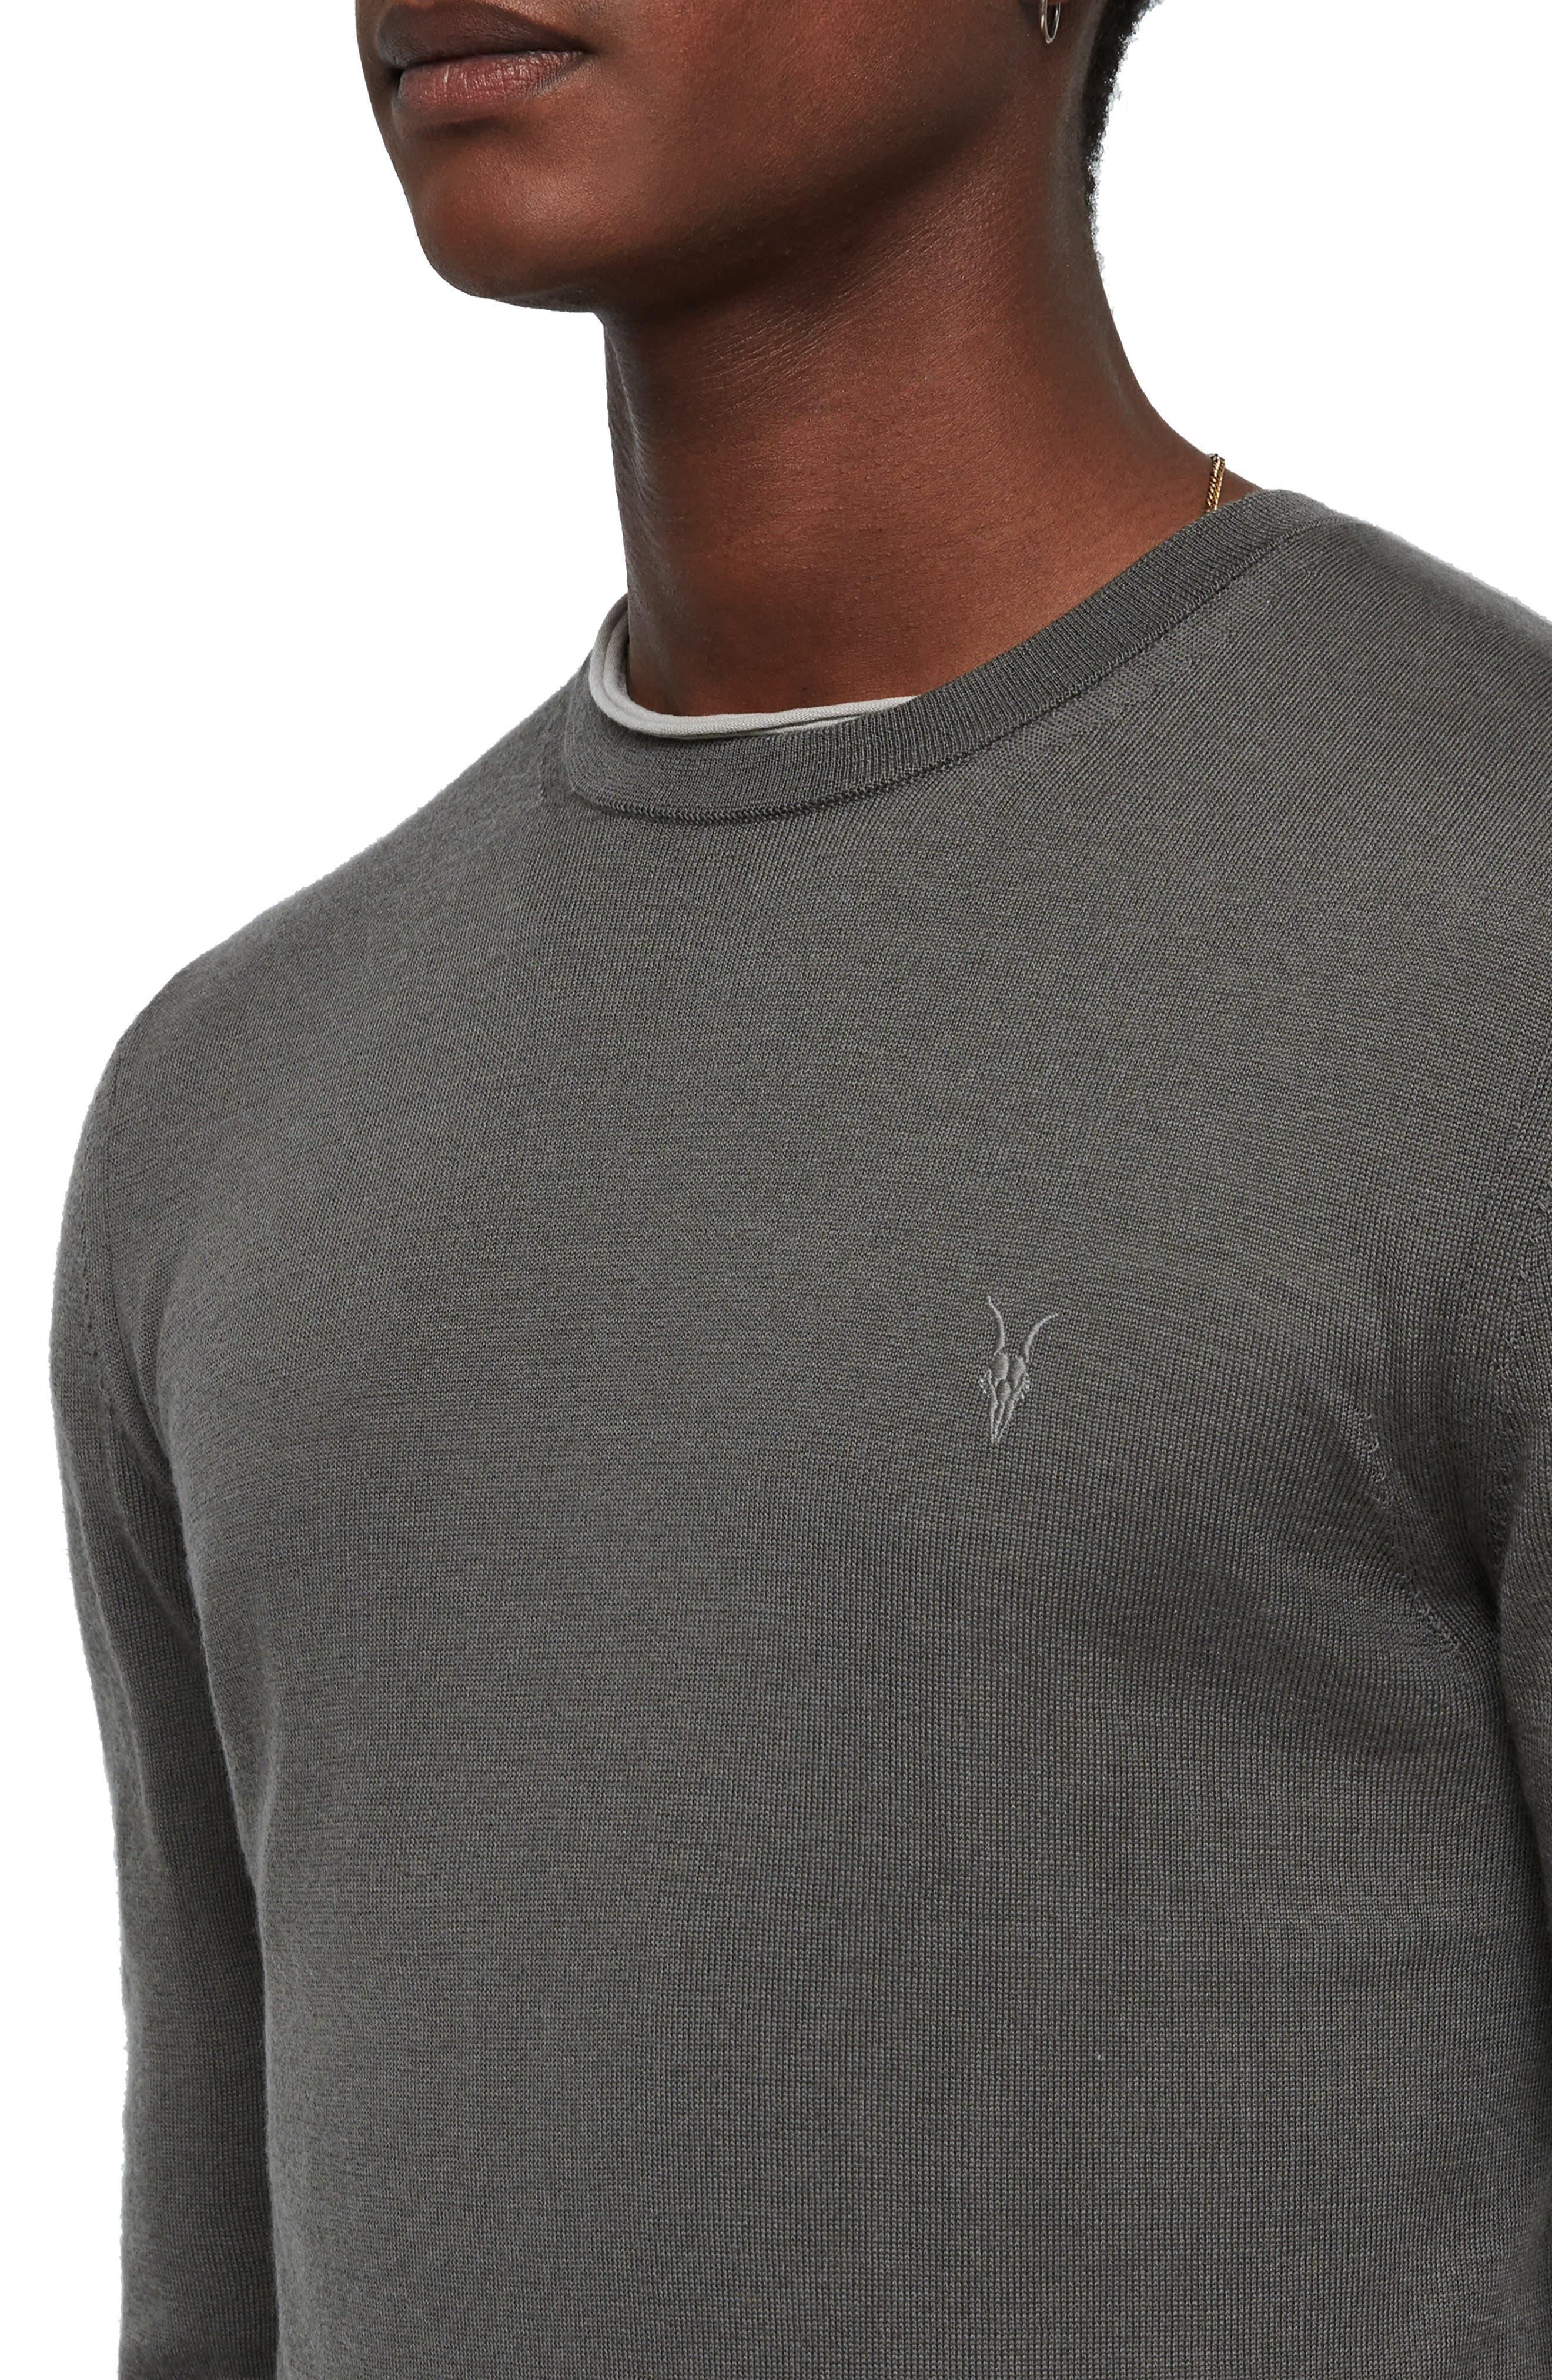 Mode Slim Fit Merino Wool Sweater,                             Alternate thumbnail 16, color,